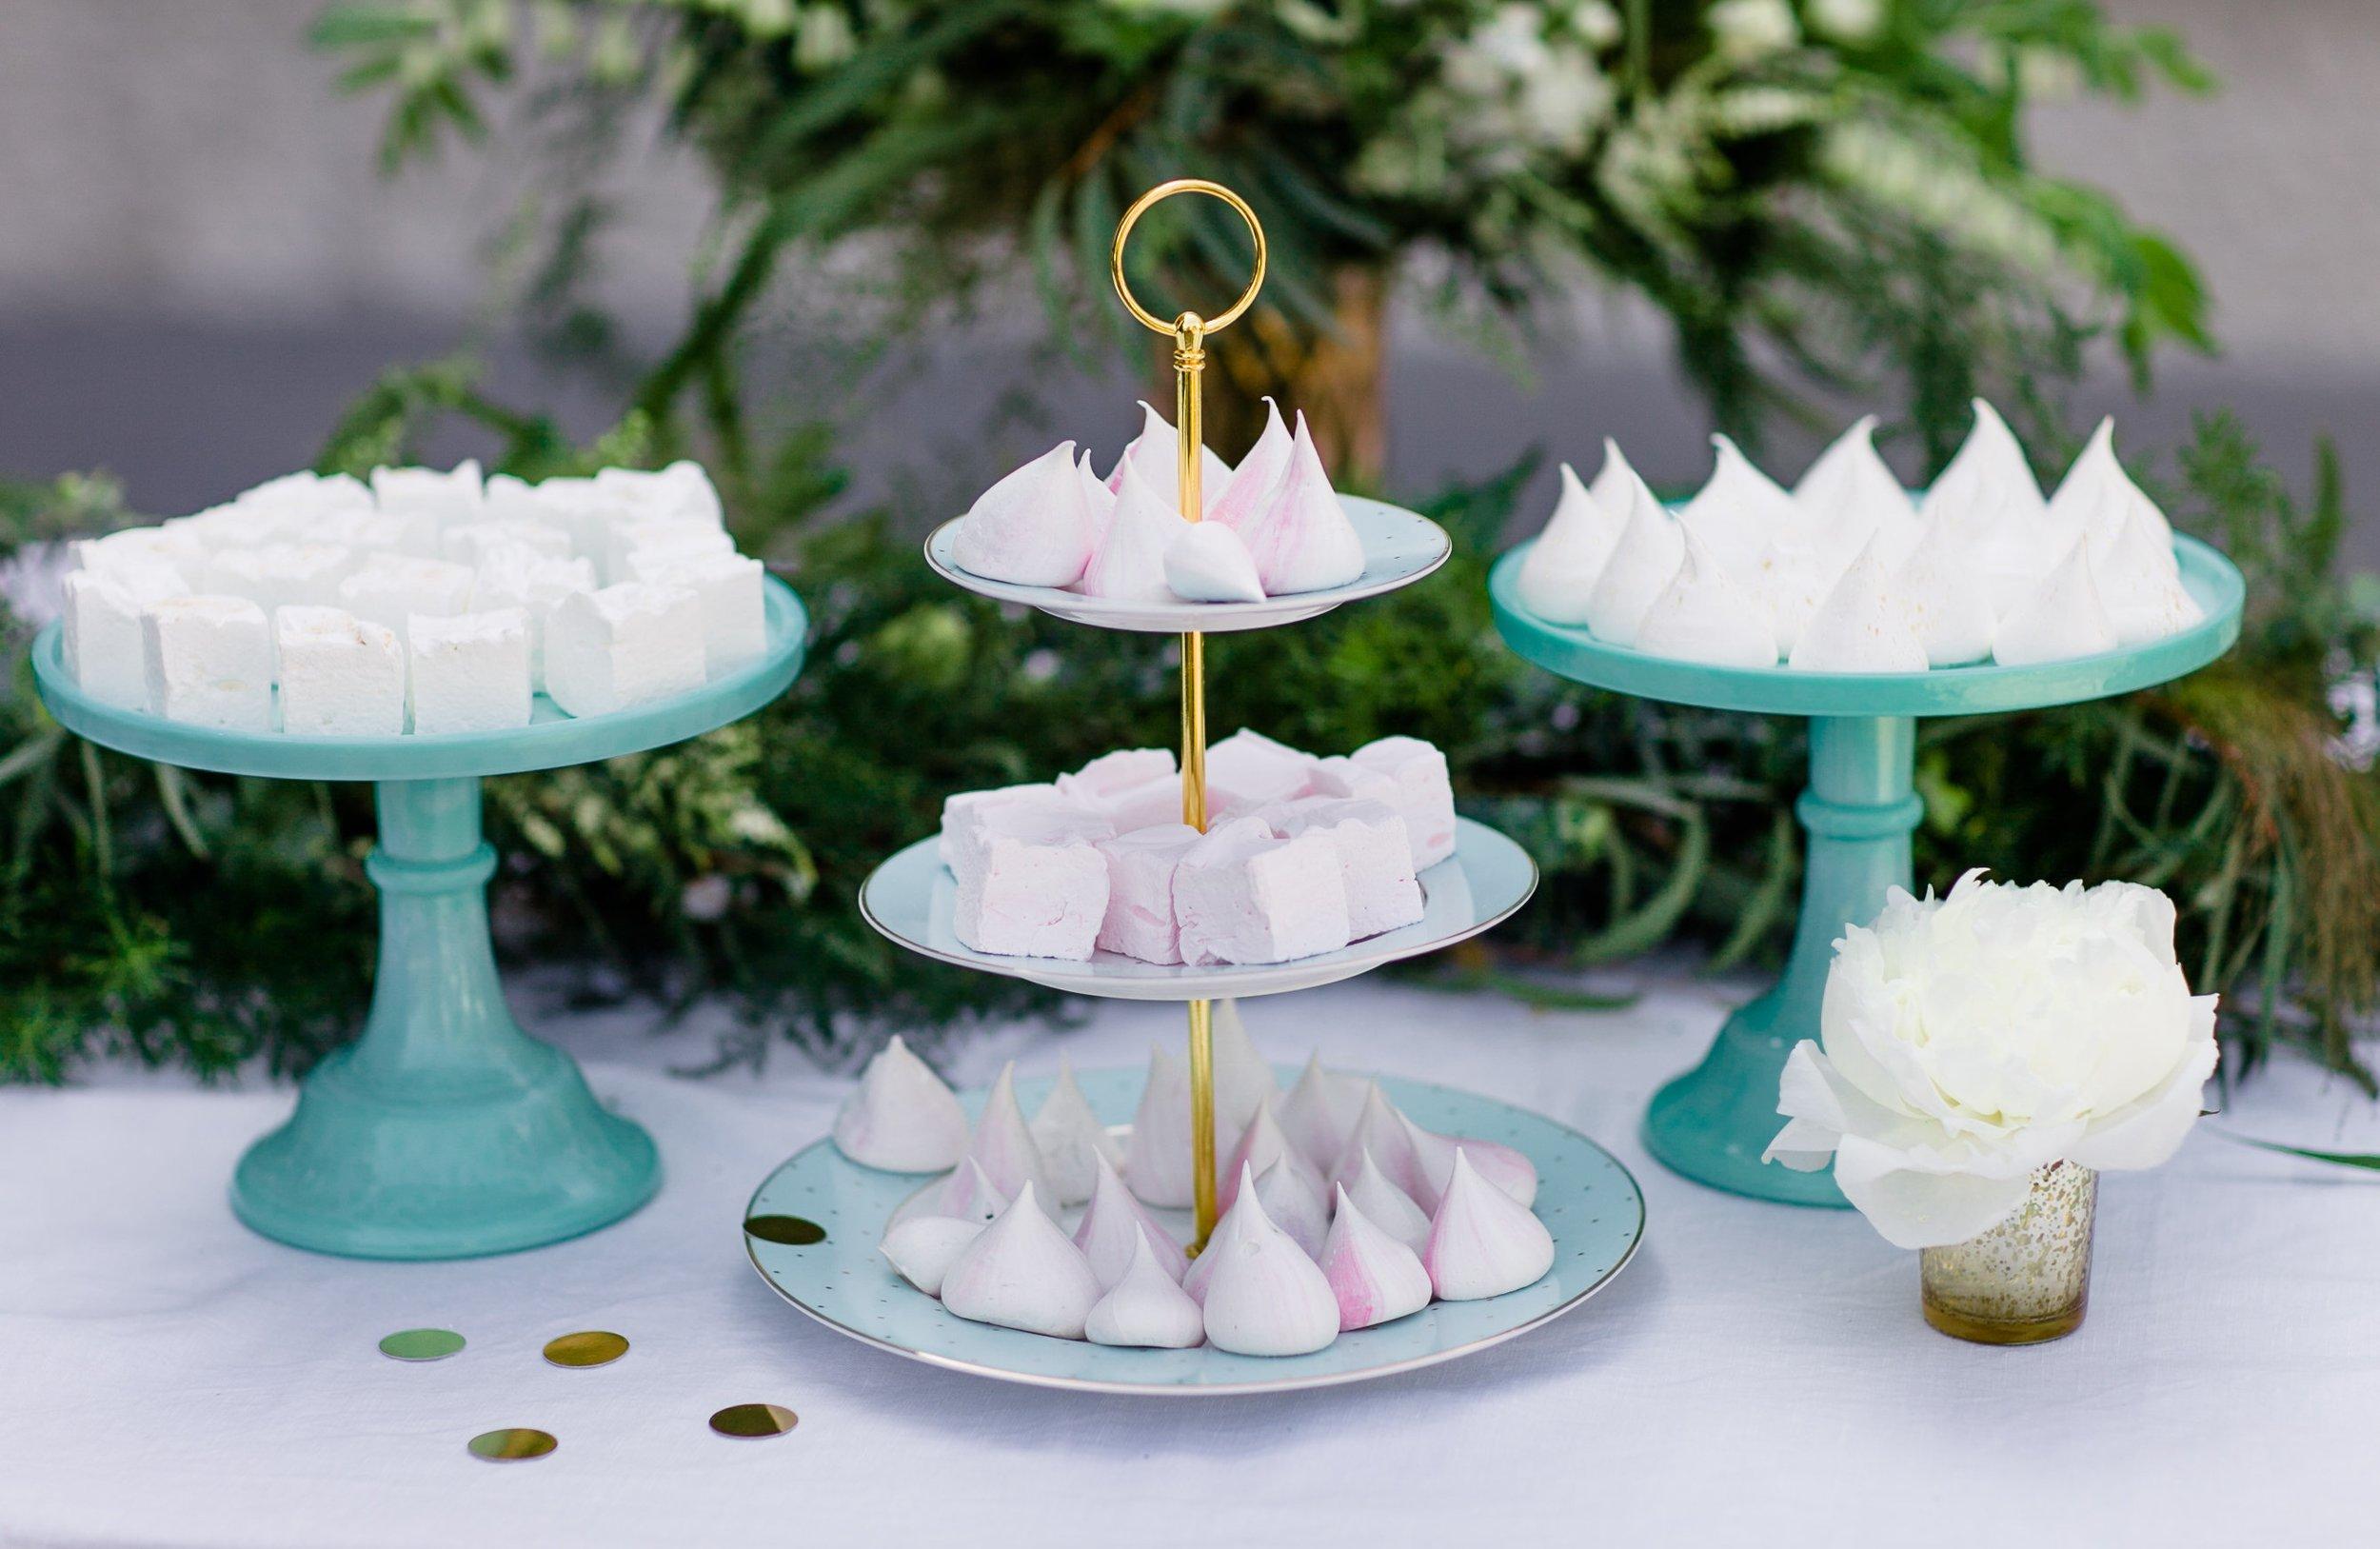 Wedding, wedding confectionery, wedding favours